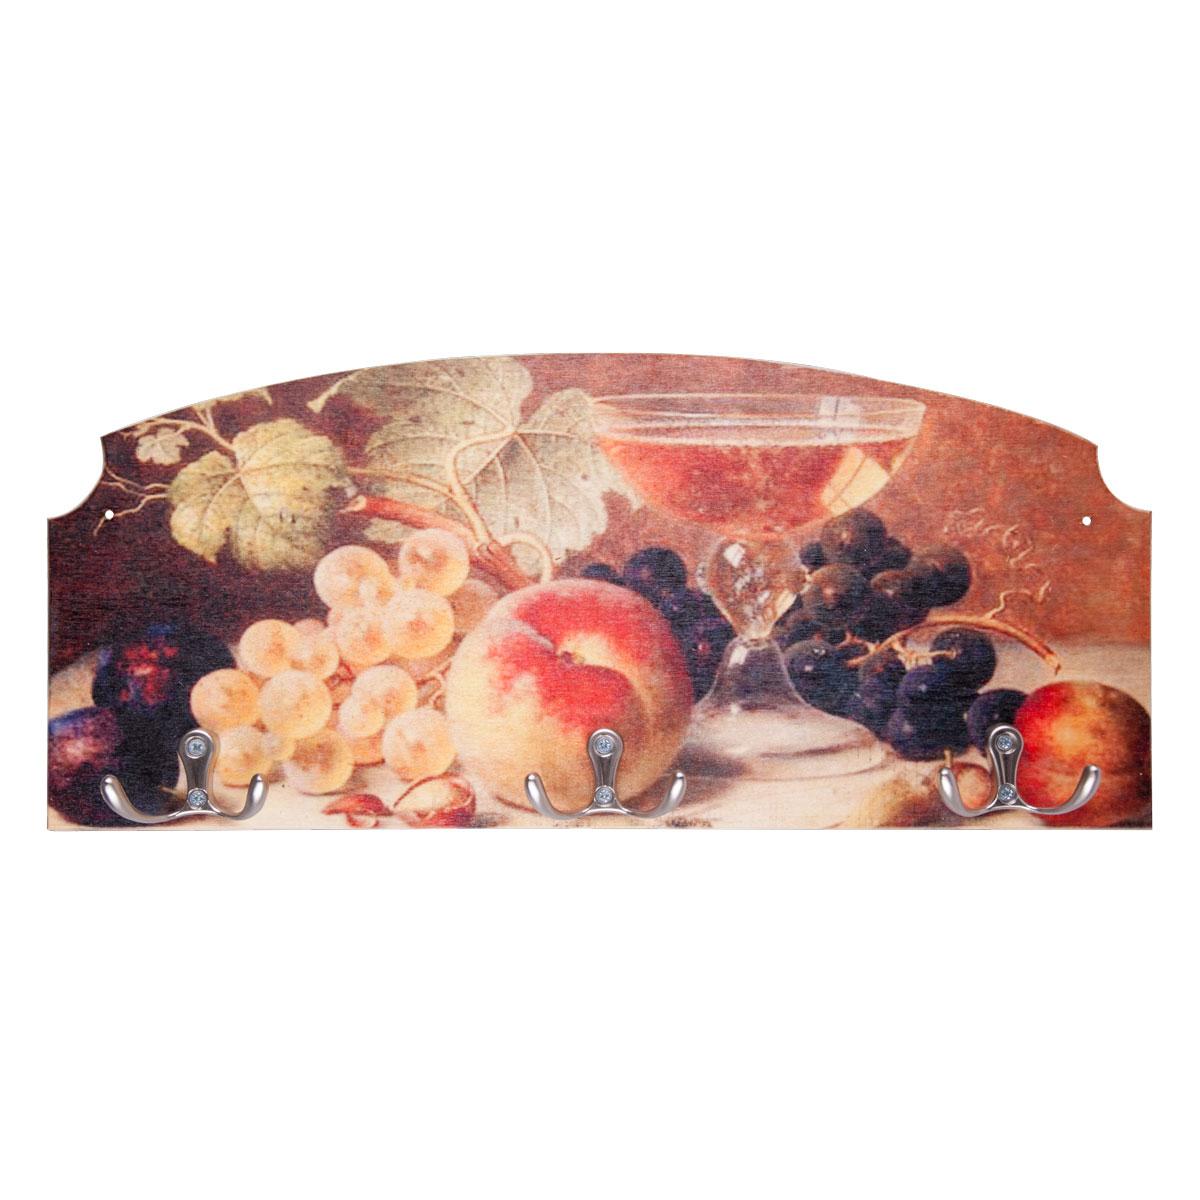 Вешалка-ключница Miolla Фруктовый сад, 37,5 х 16,5 см ключницы miolla вешалка ключница угощение